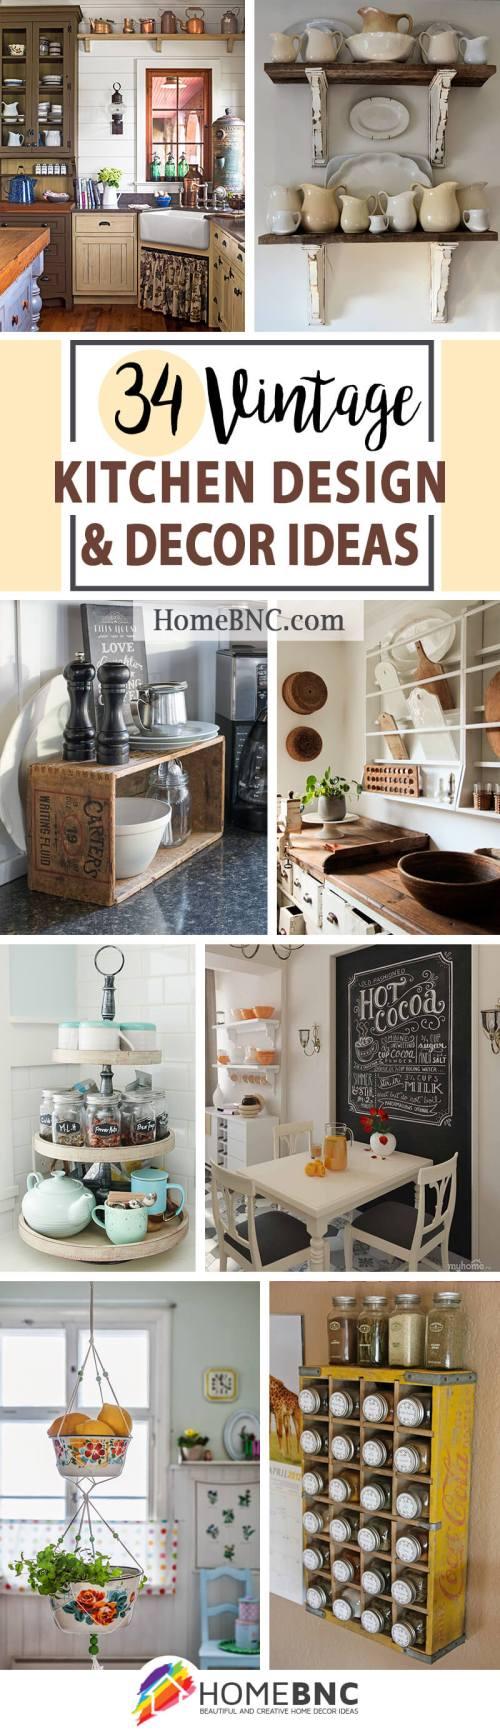 Medium Of Decor Ideas For Kitchen